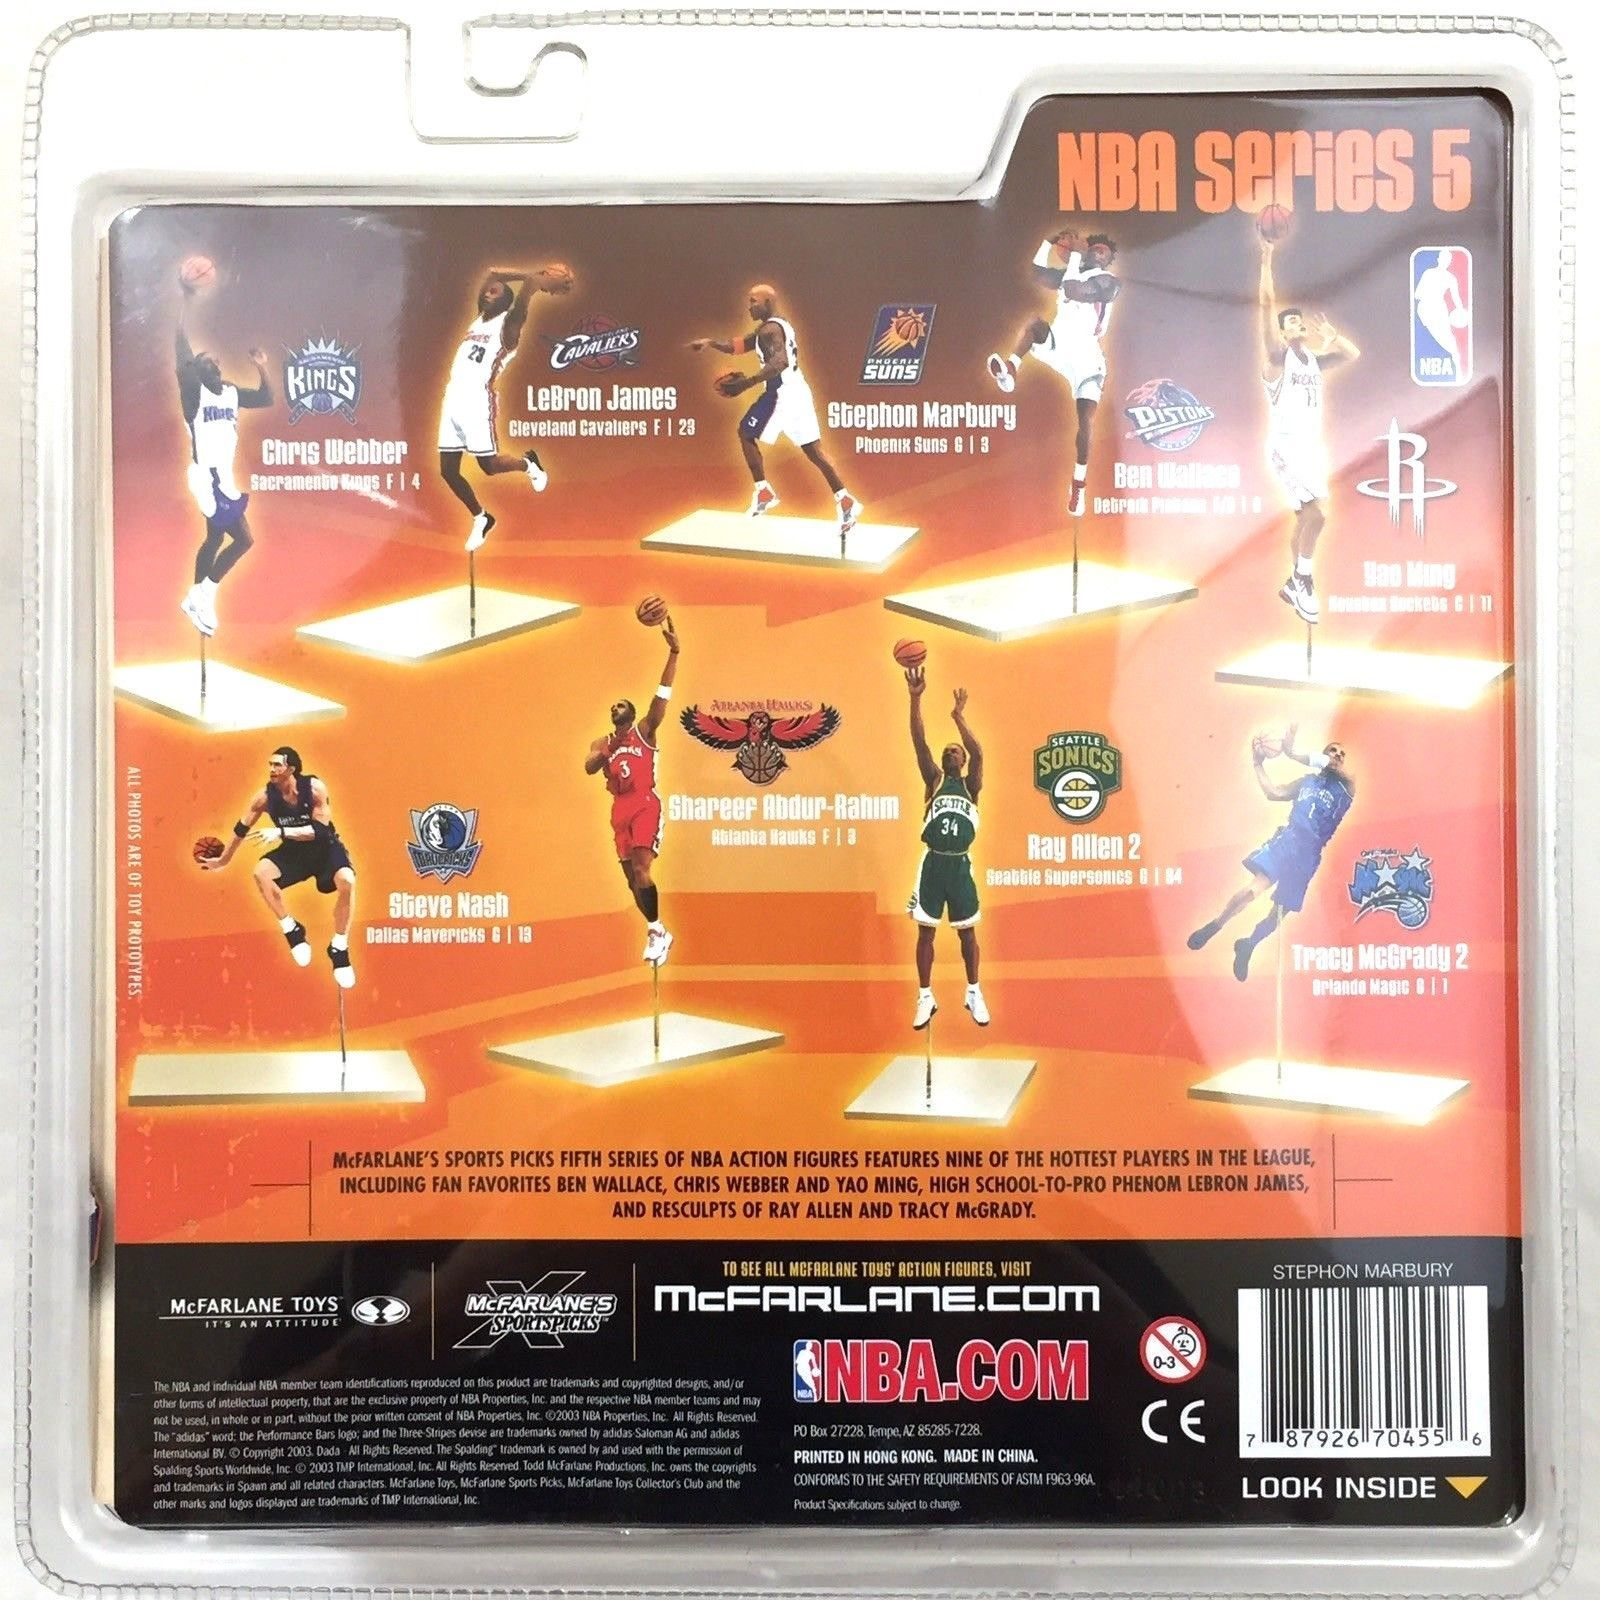 McFarlane Series 5 Stephon Marbury Phoenix Suns Variant